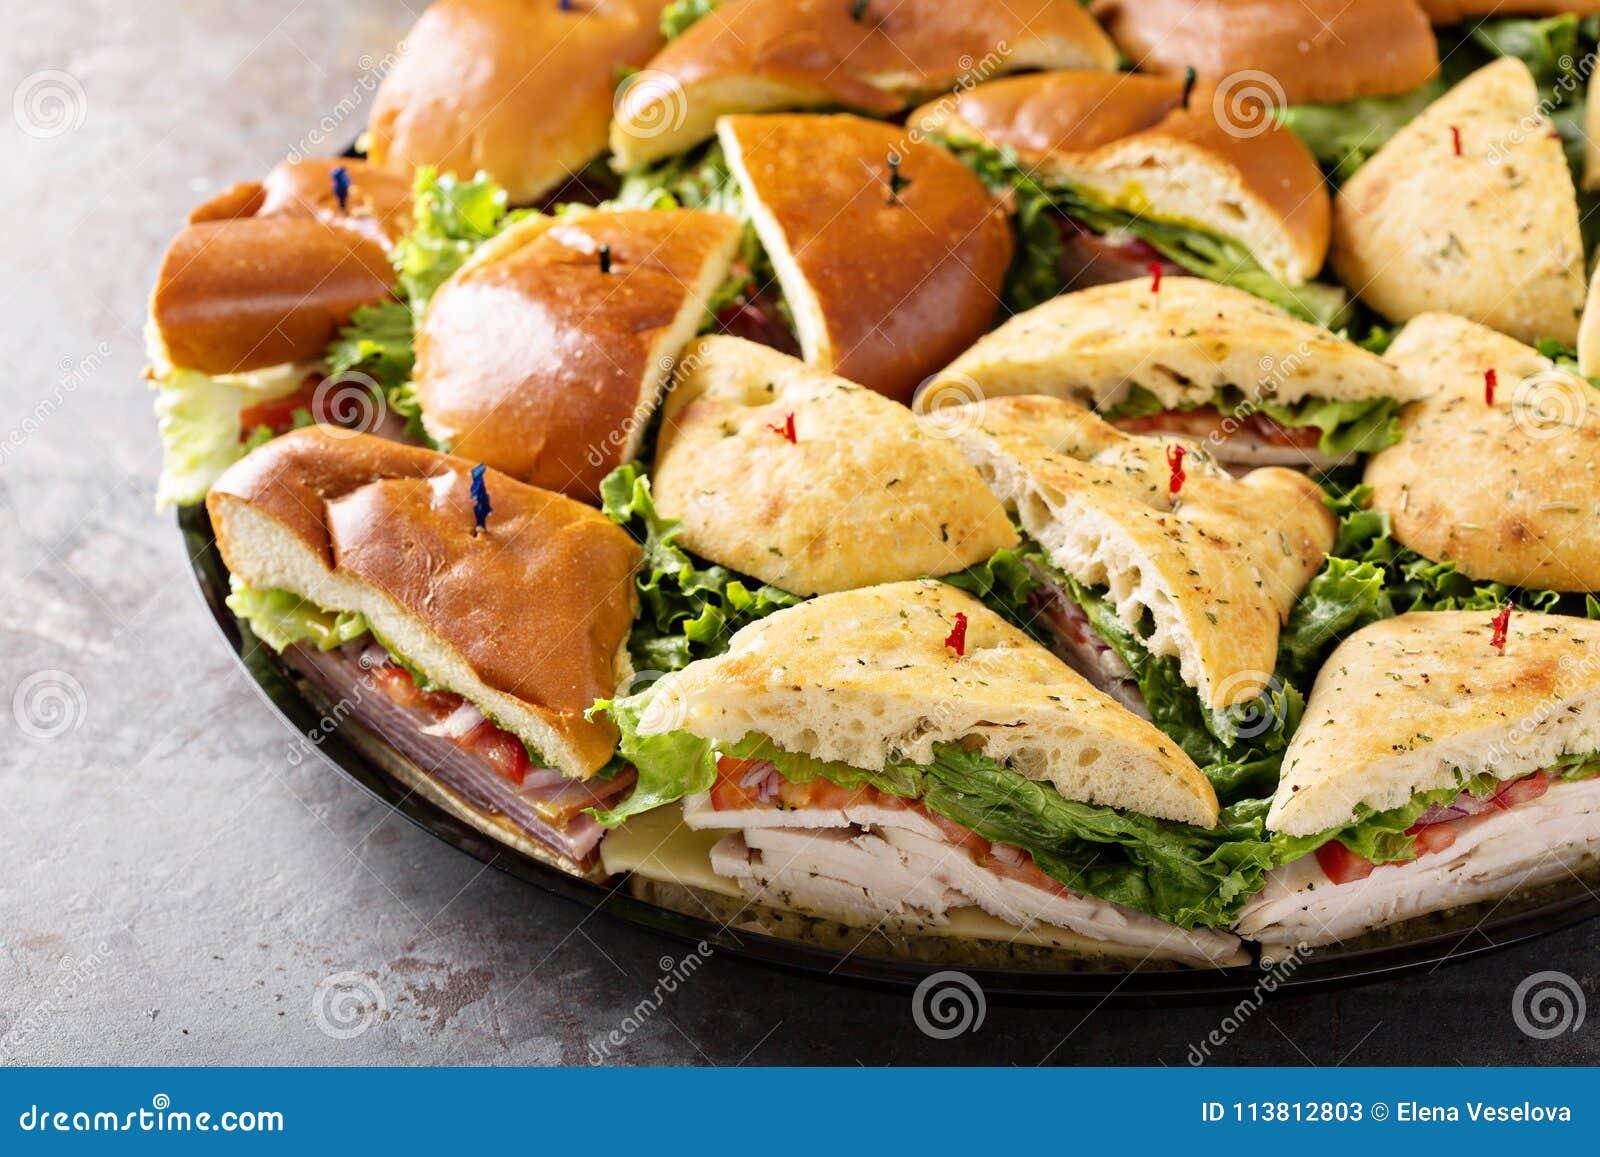 Bandeja de sanduíches do peru e de presunto